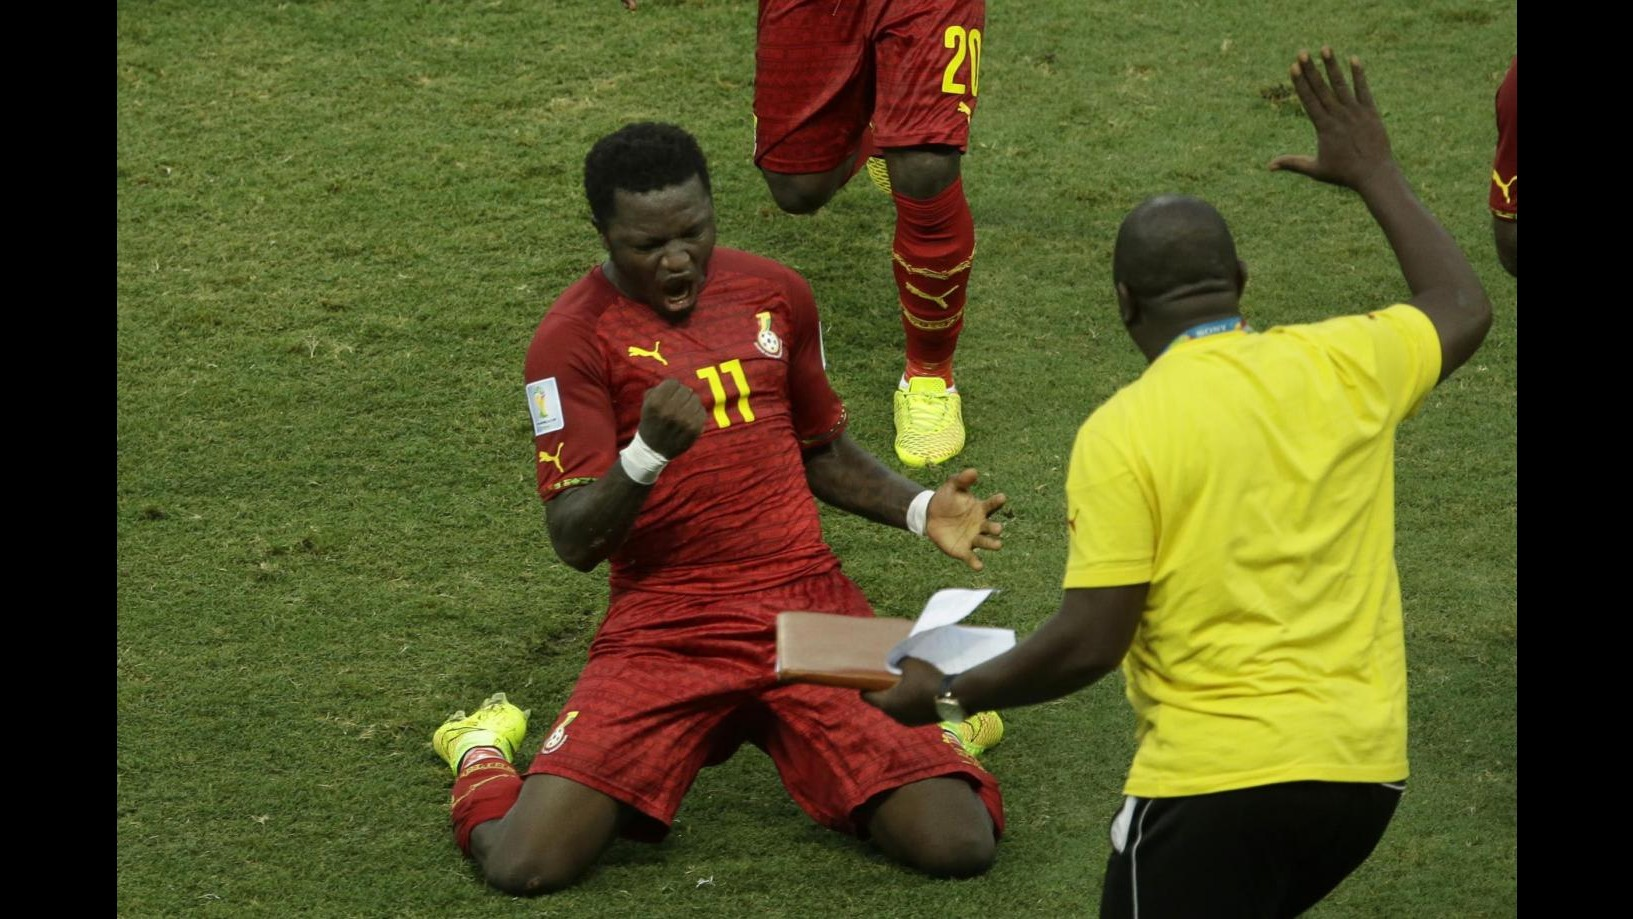 Mondiali 2014, Ghana: Muntari e Boateng espulsi dal ritiro per motivi disciplinari